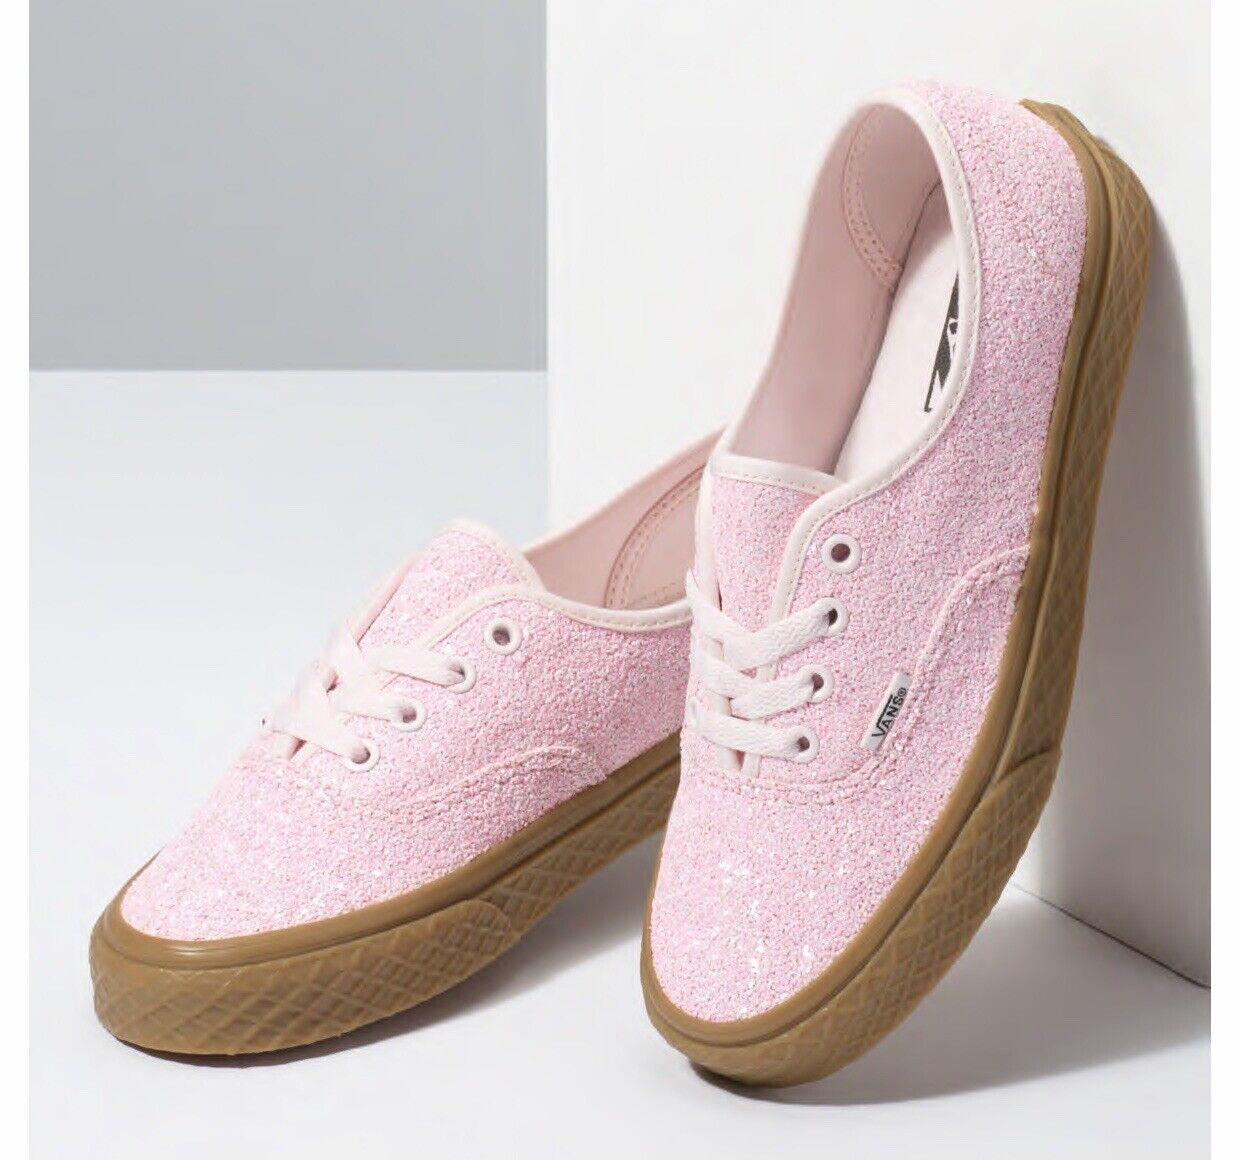 VANS Girls Authentic Glitter Ice Cream